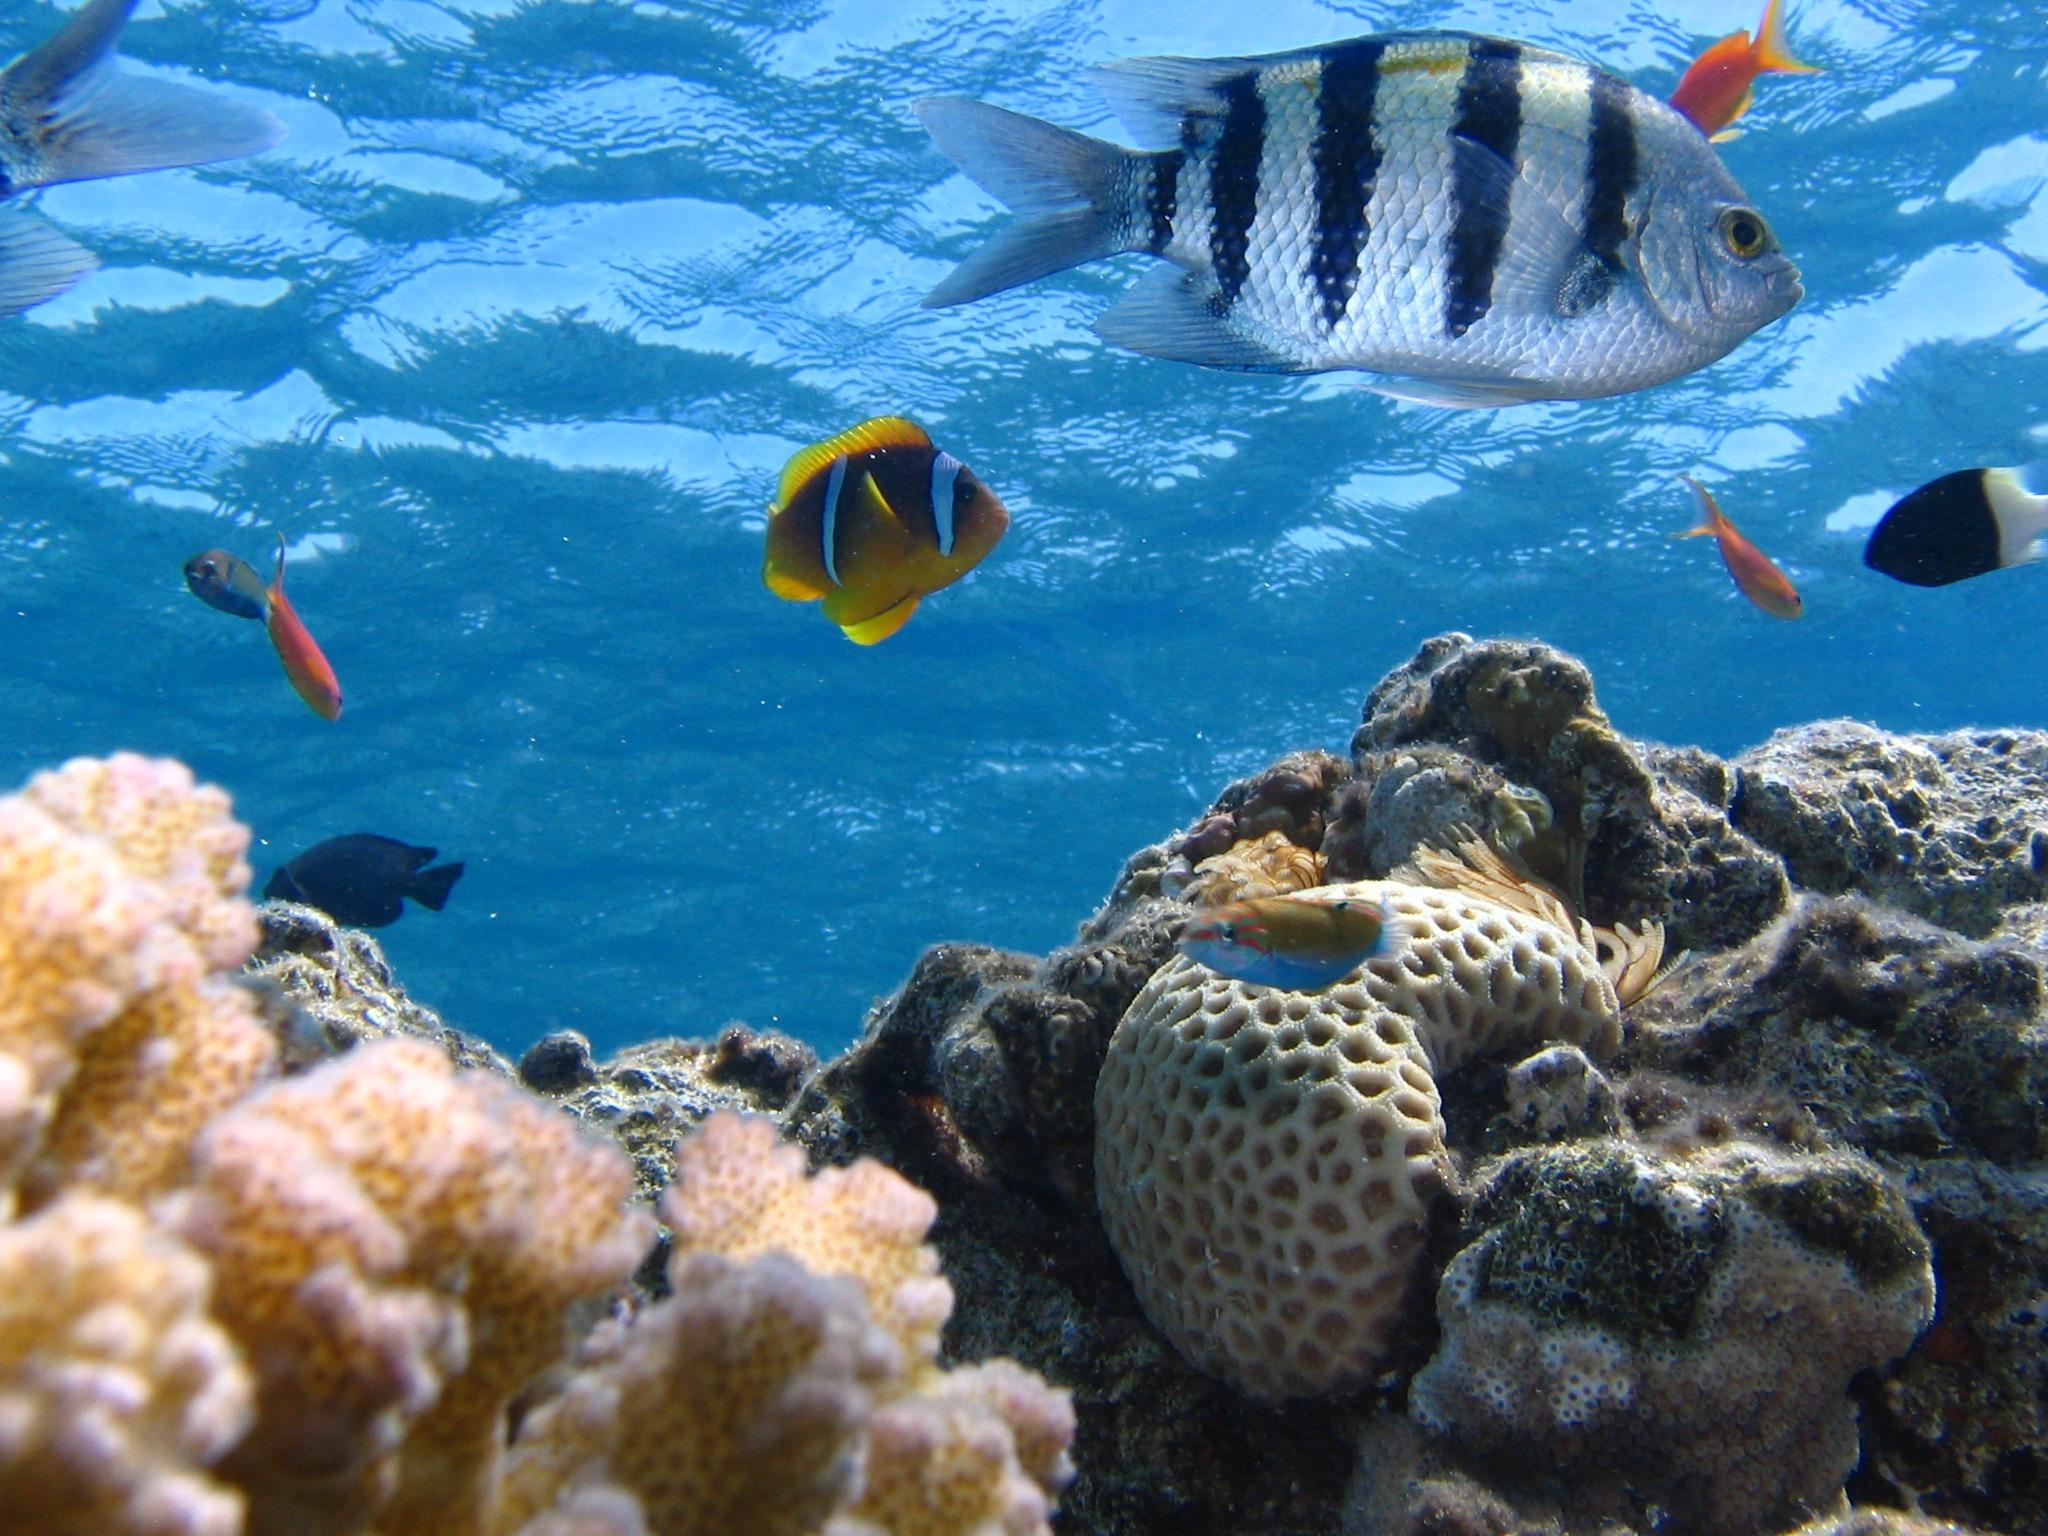 Immagini belle mare oceano animale natura sott 39 acqua for Acquario acqua salata